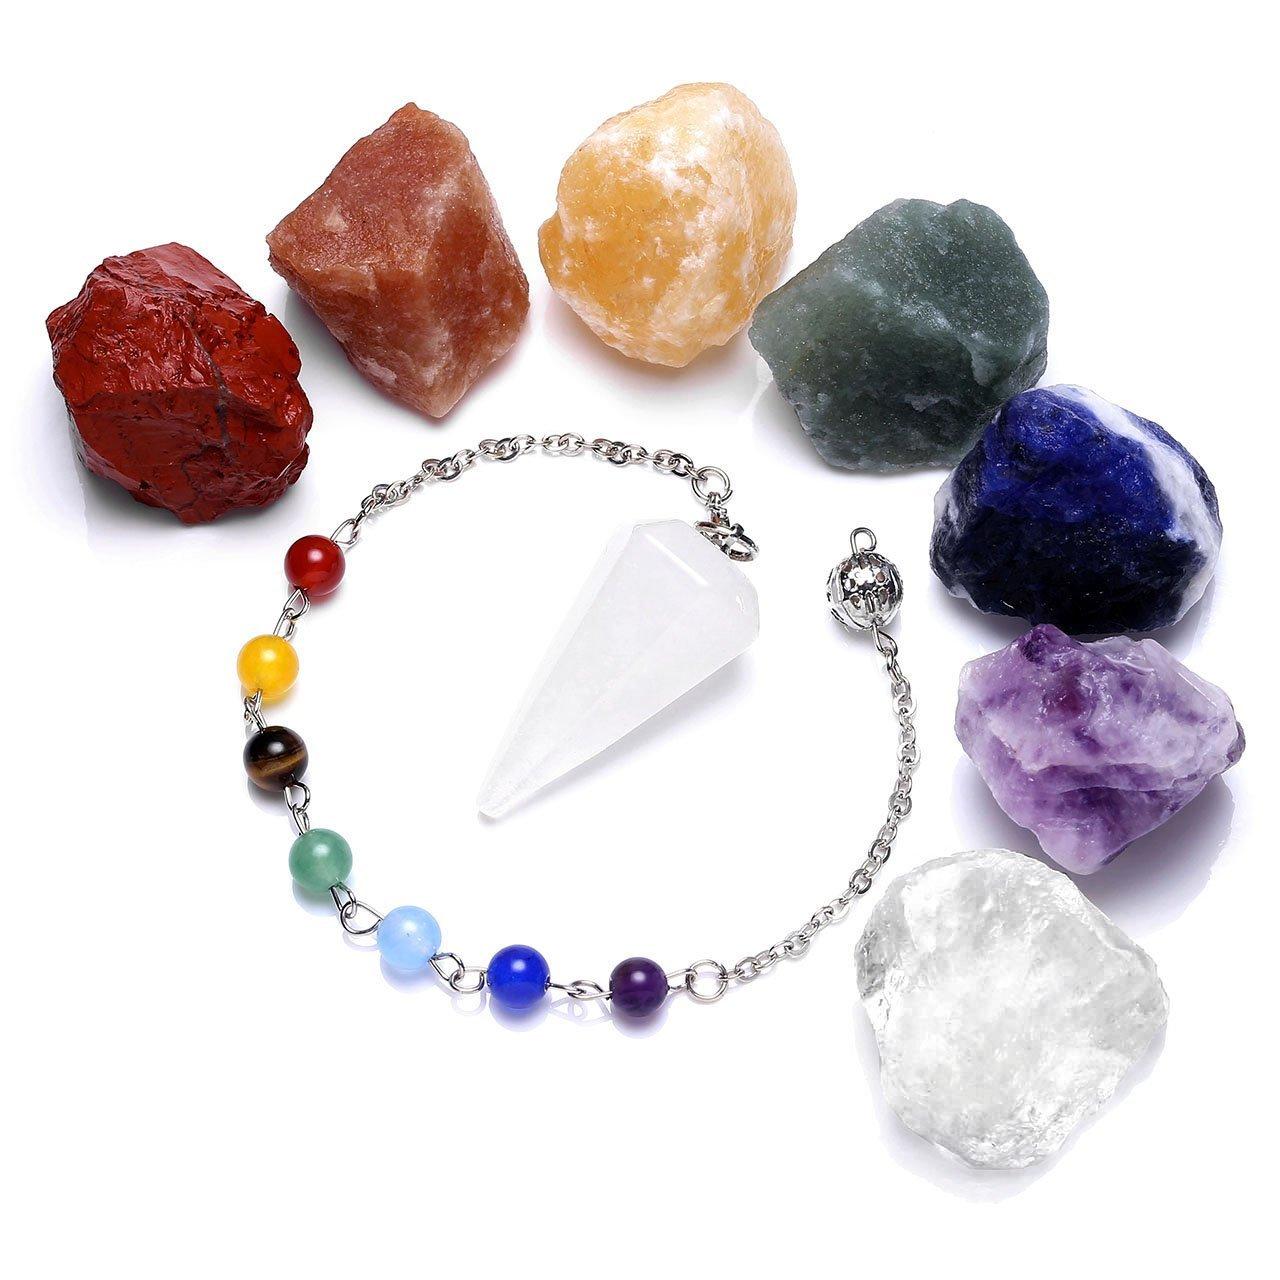 Natural Raw Crude Amethyst Quartz Crystal Dowsing Chakra Pendulum for Divination Real Stone Reiki Pendant Necklace for Women Energy Healing